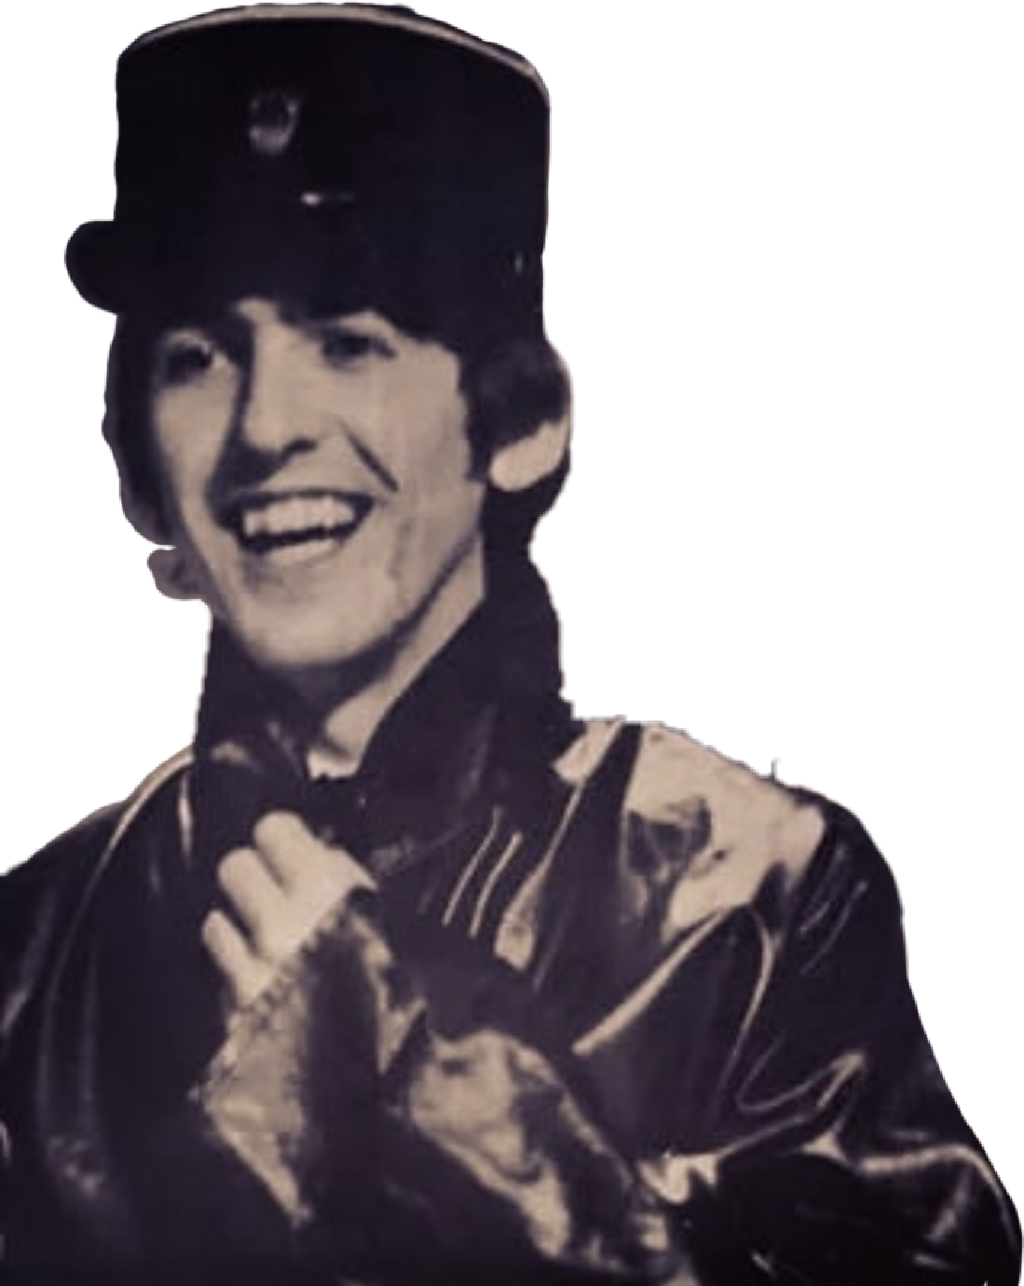 George harrison ♡♡♡ johnlennon beatles thebeatles paulm.